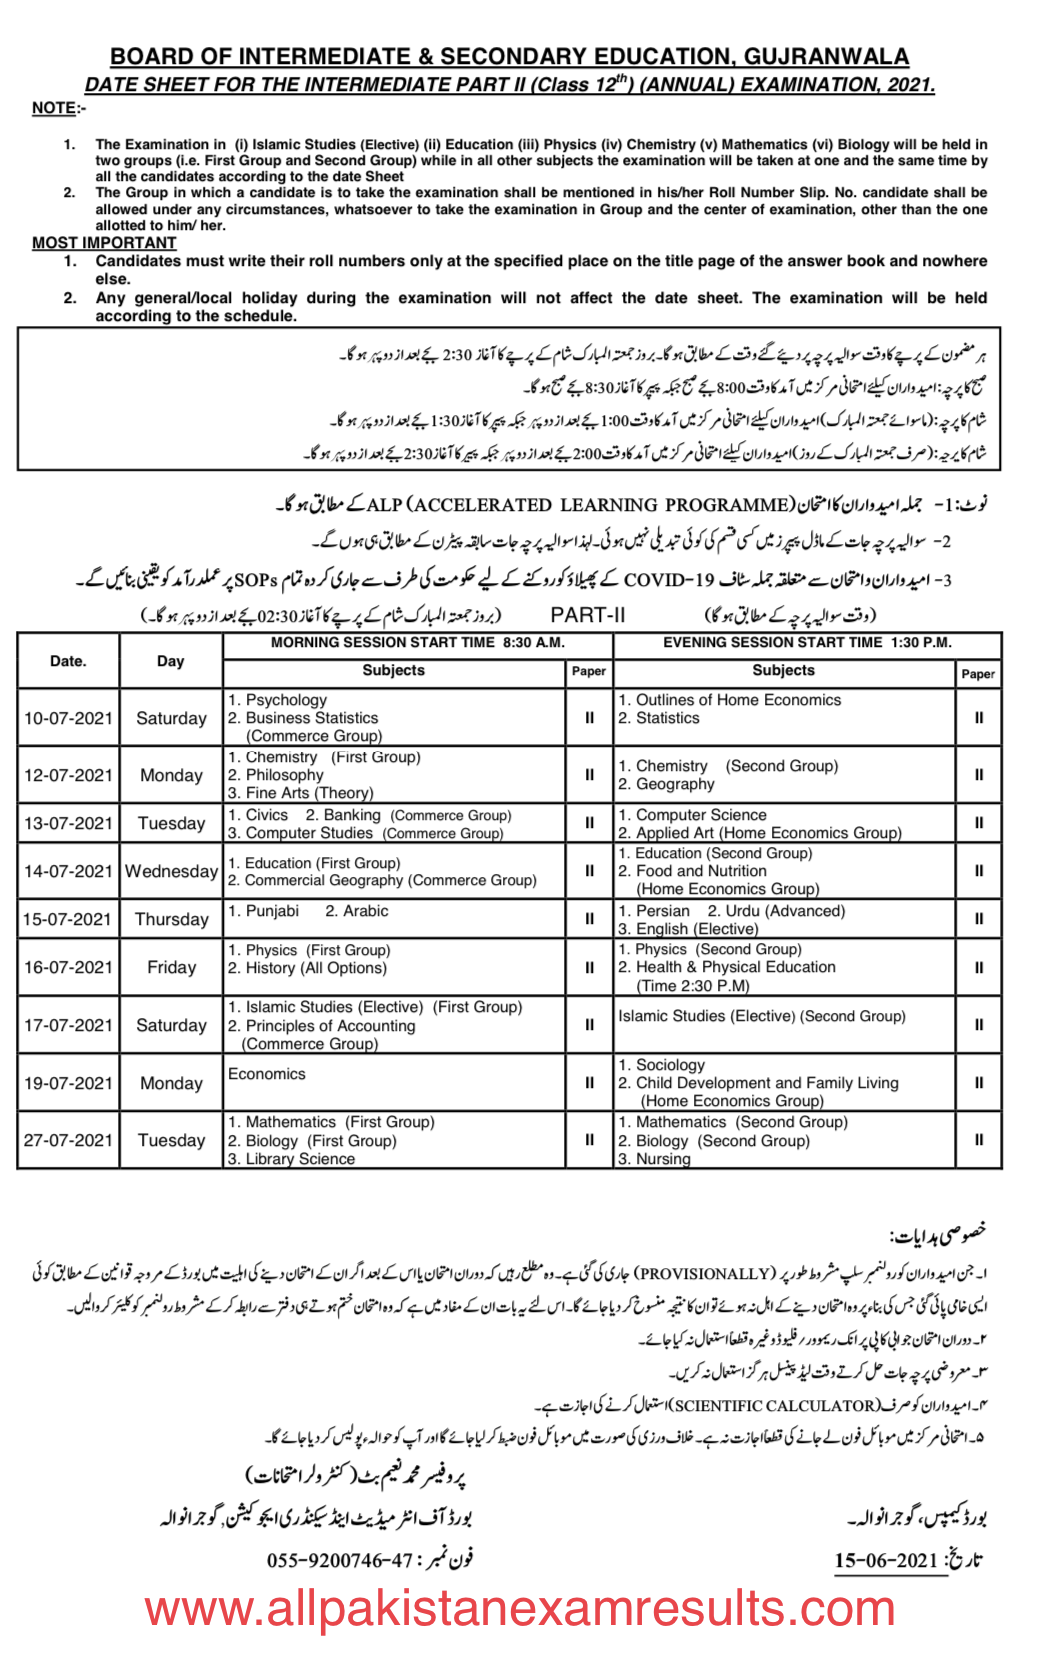 Date Sheet Gujranwala Board Inter Part 2 2021 Annual Exam